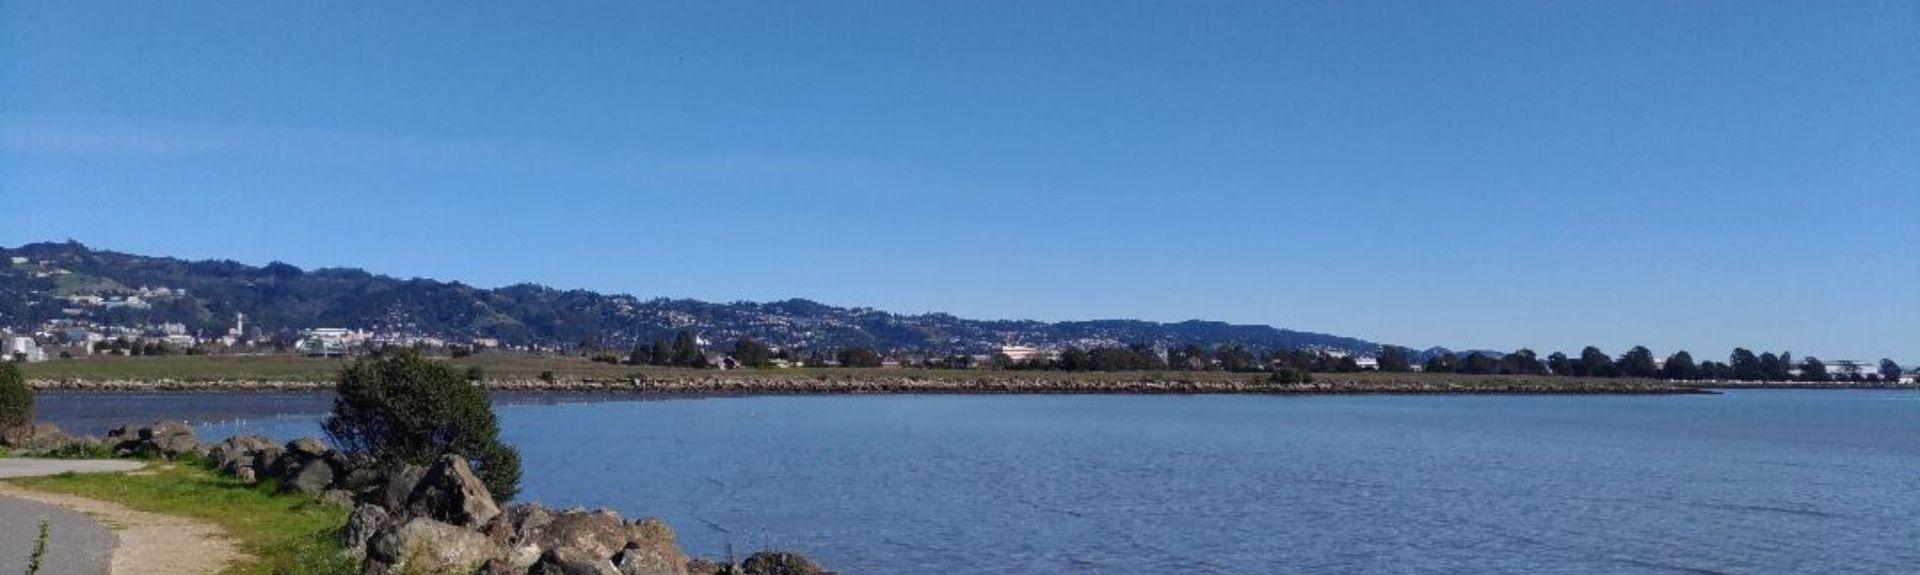 Emeryville, CA, USA